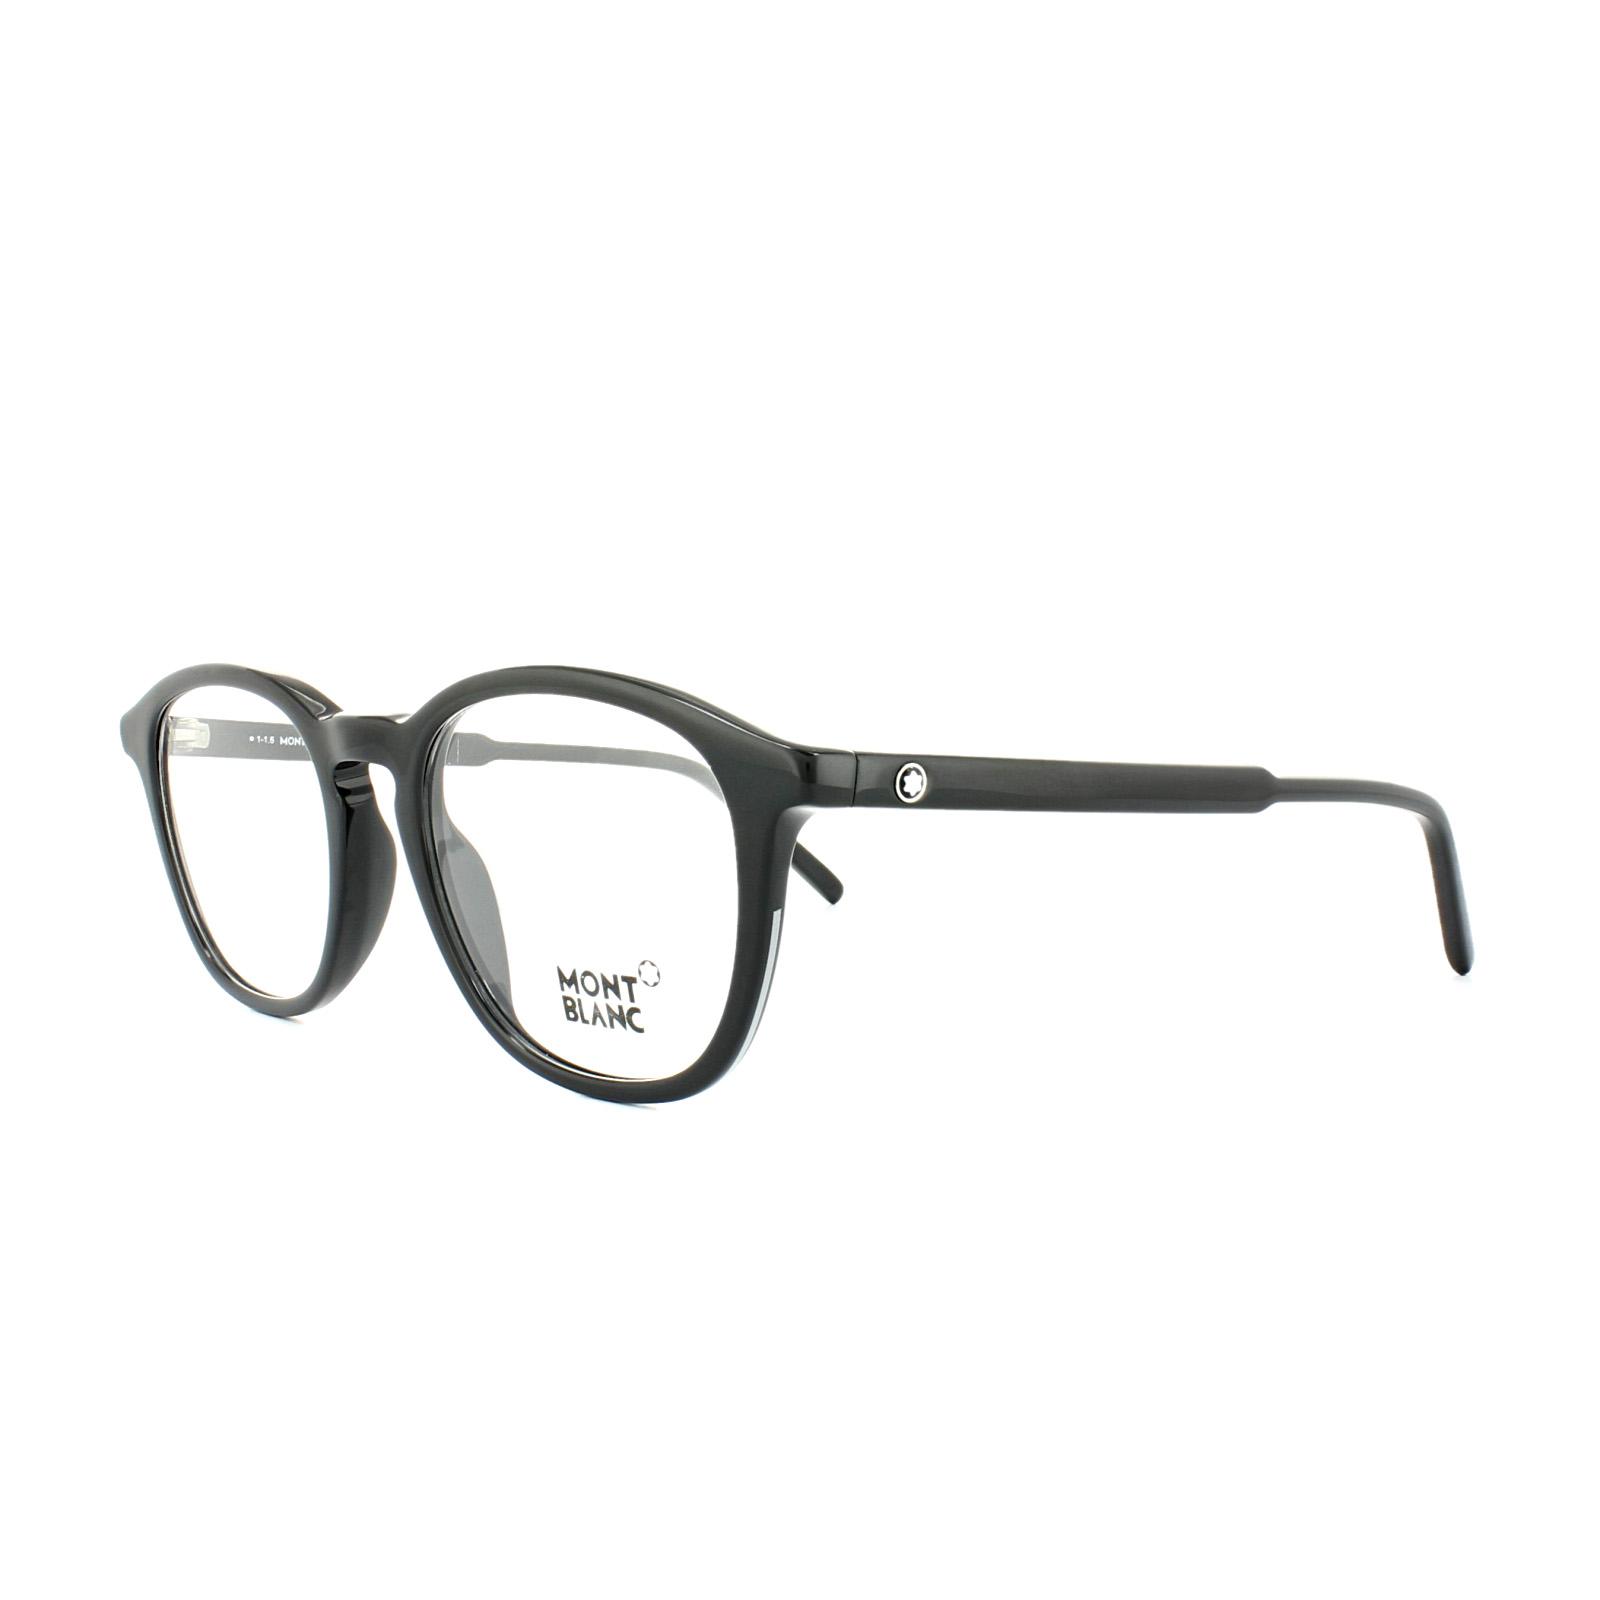 8f41044b0f CENTINELA Mont Blanc gafas de Marcos MB0613 001 negro brillante